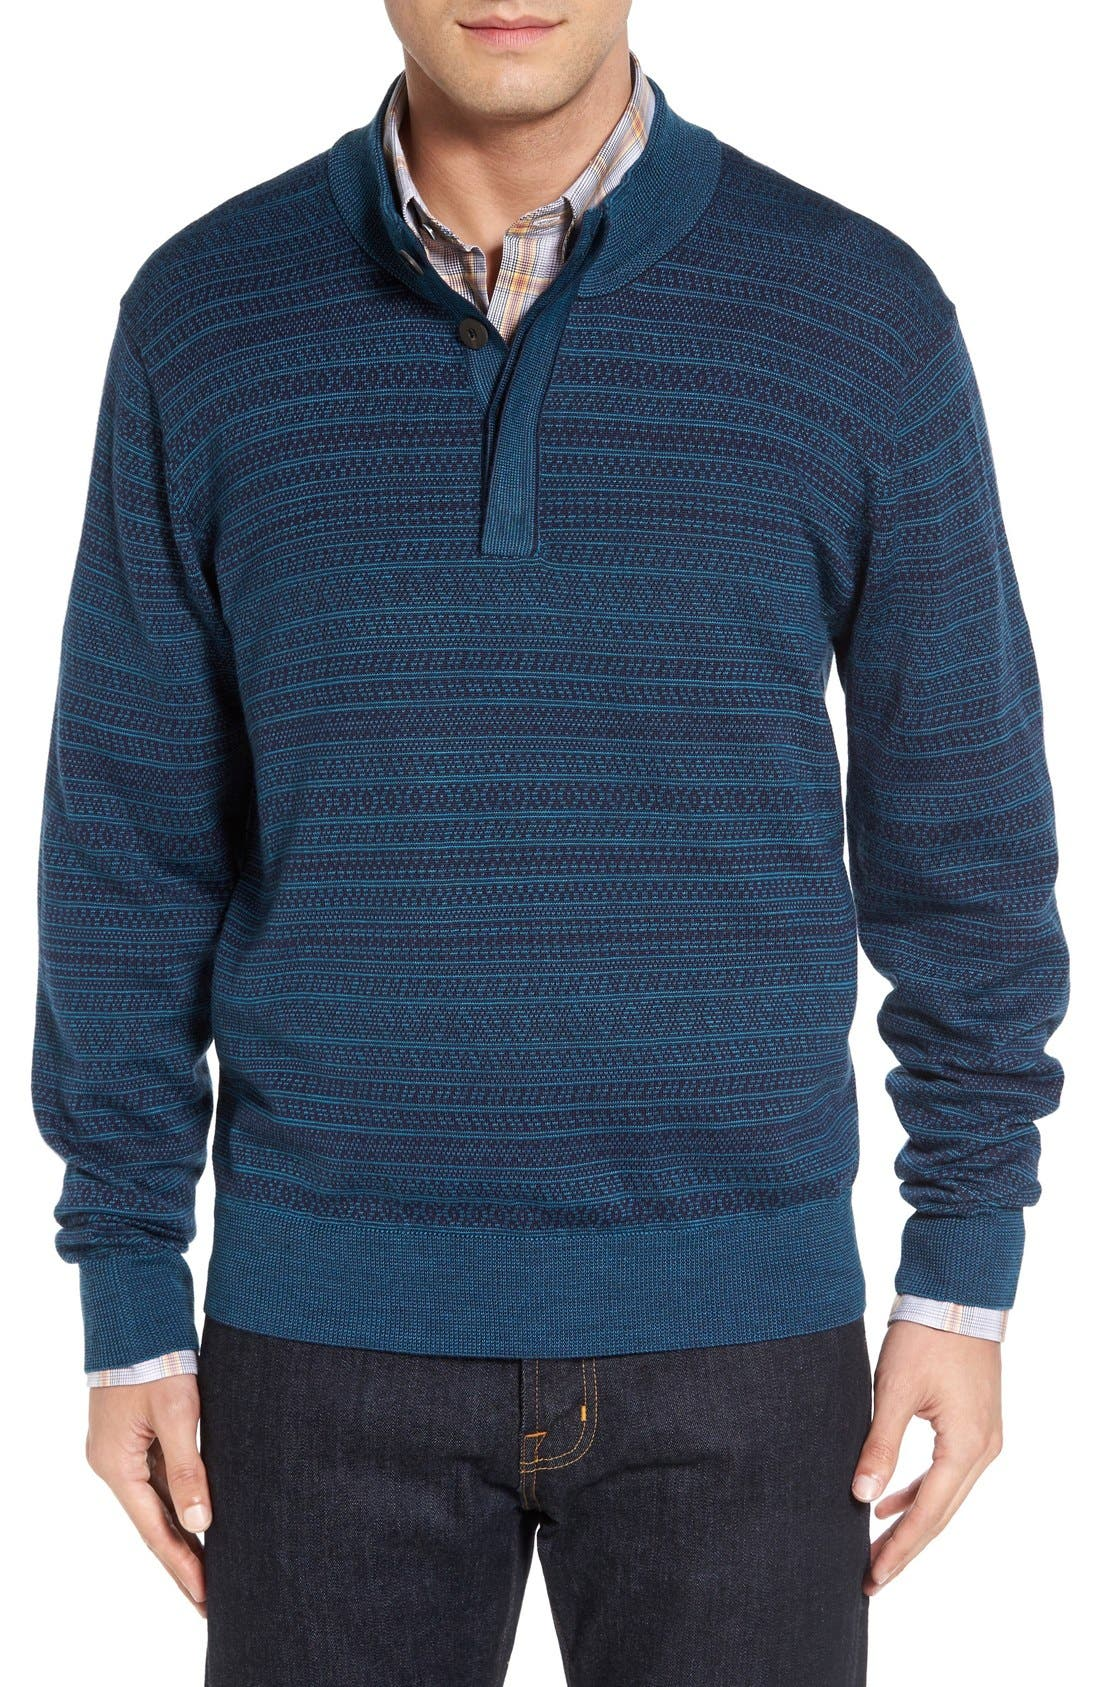 'Douglas Forest' Jacquard Wool Blend Sweater,                             Main thumbnail 1, color,